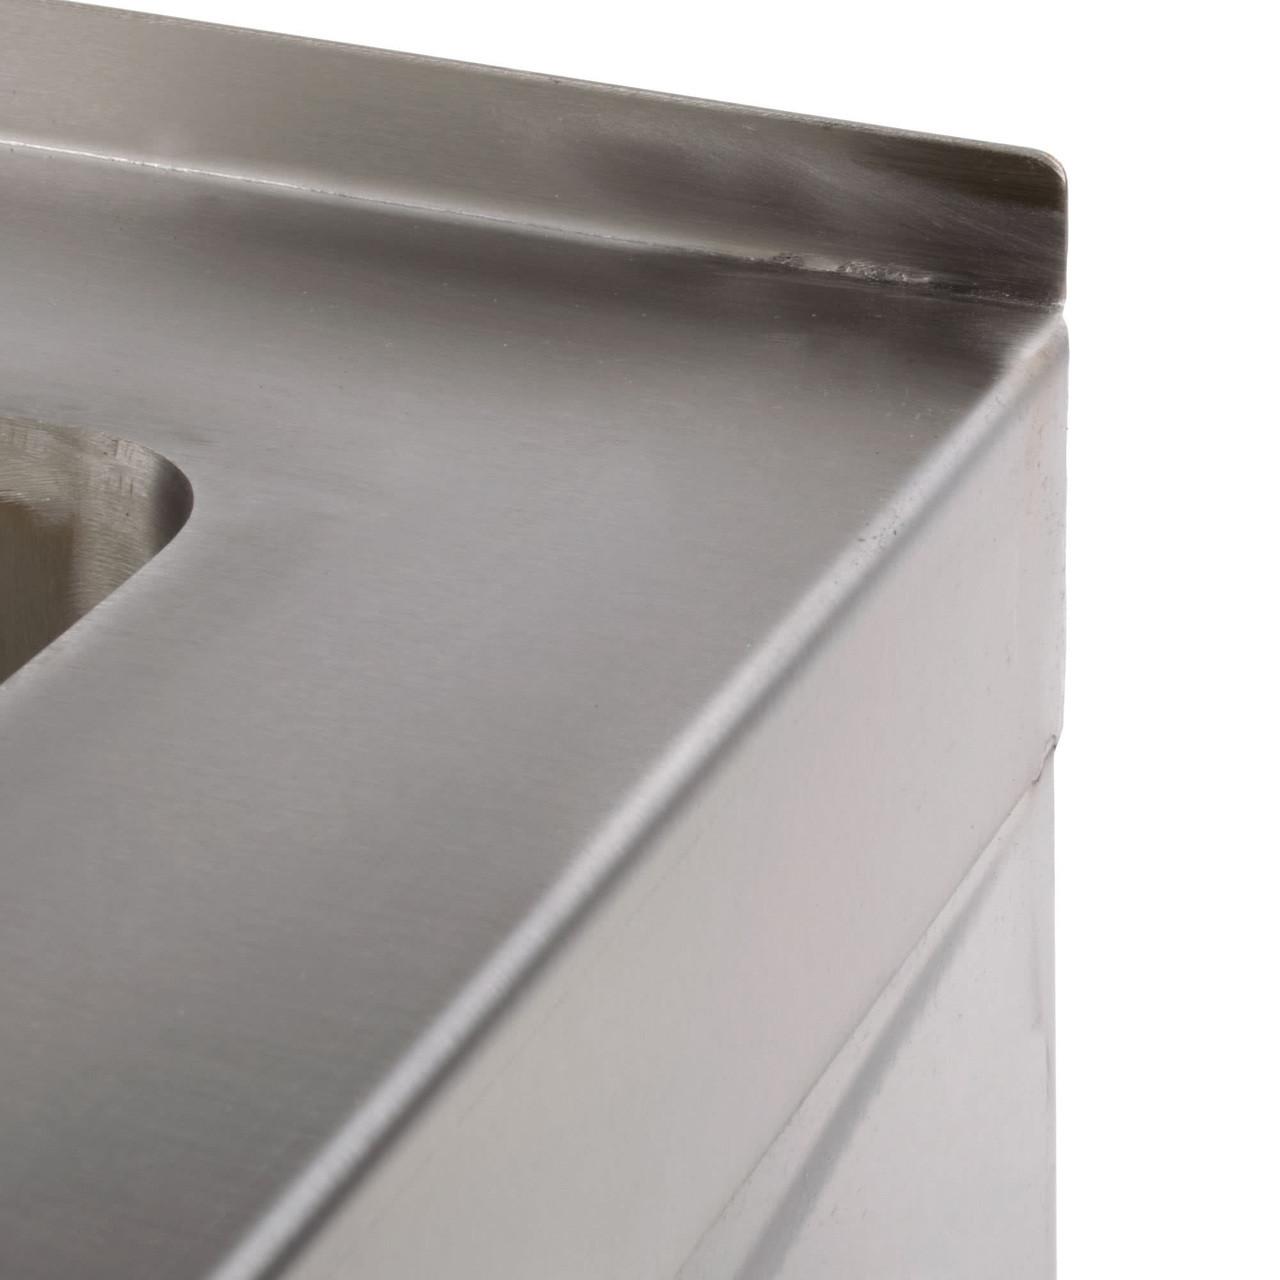 "Floor Mounted Mop Sink  25""W x 21""D x 10""H"